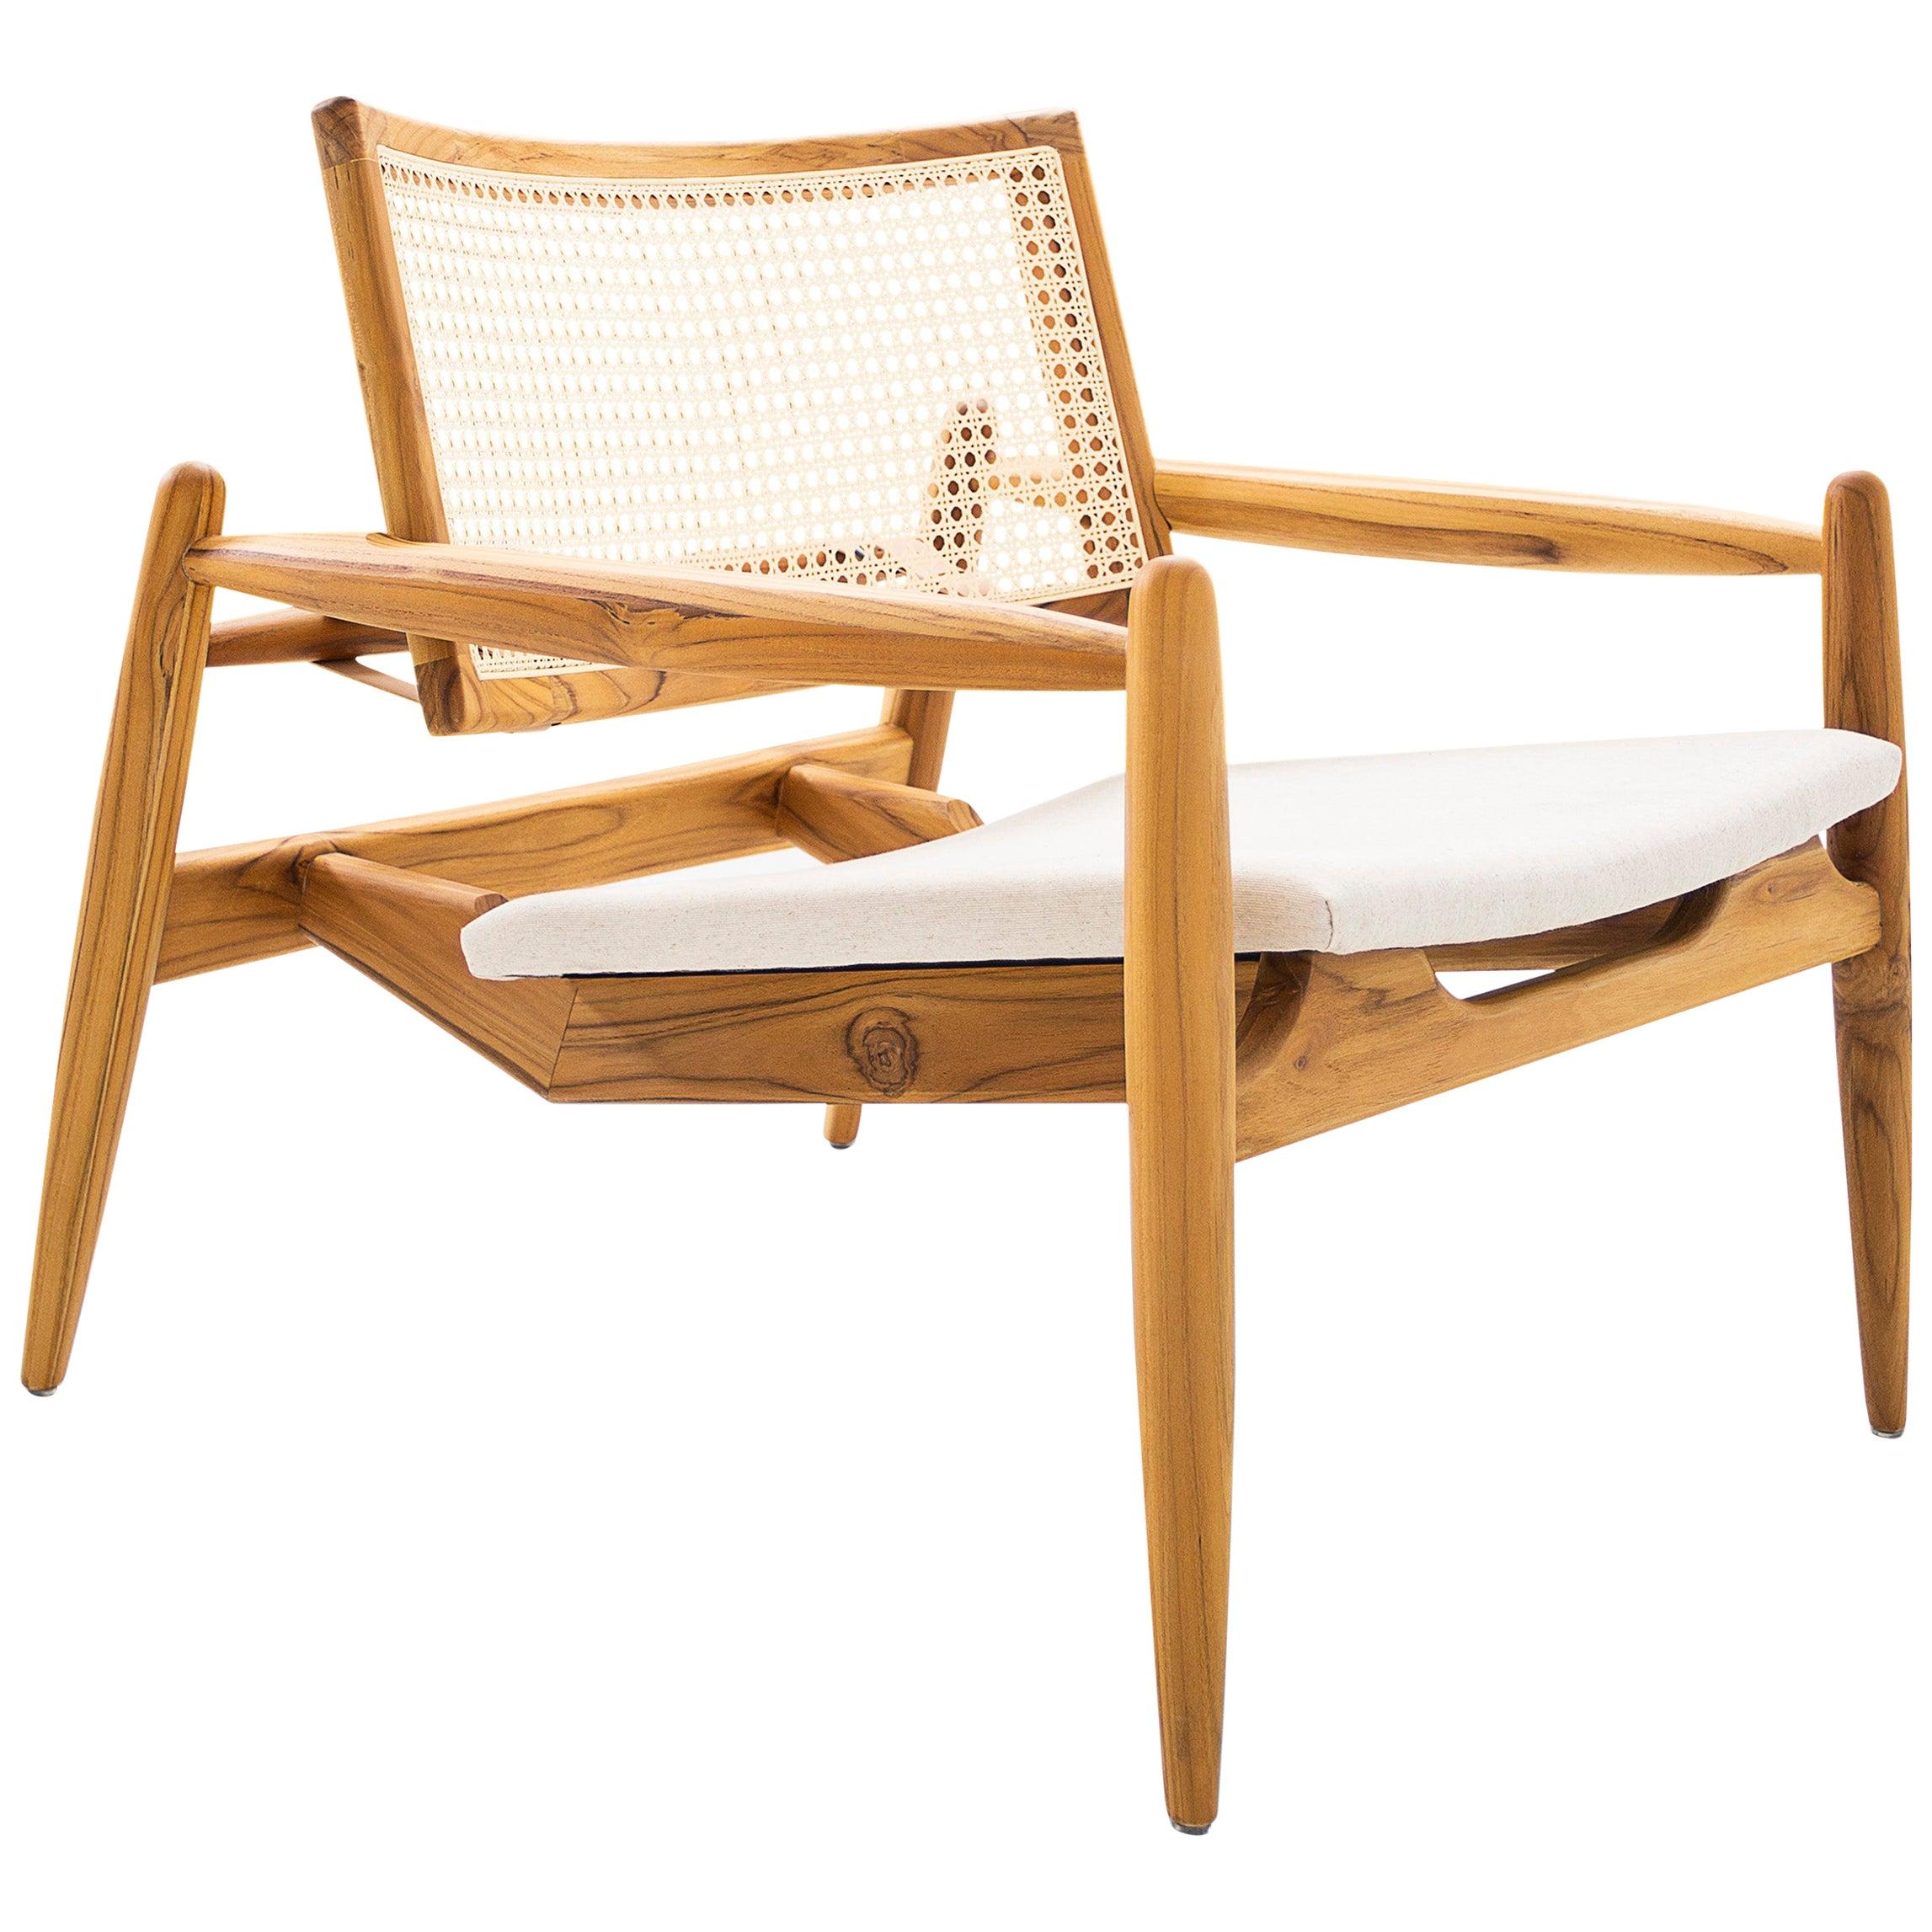 Soho Curved Cane-Back Chair in Teak and Oatmeal Fabric